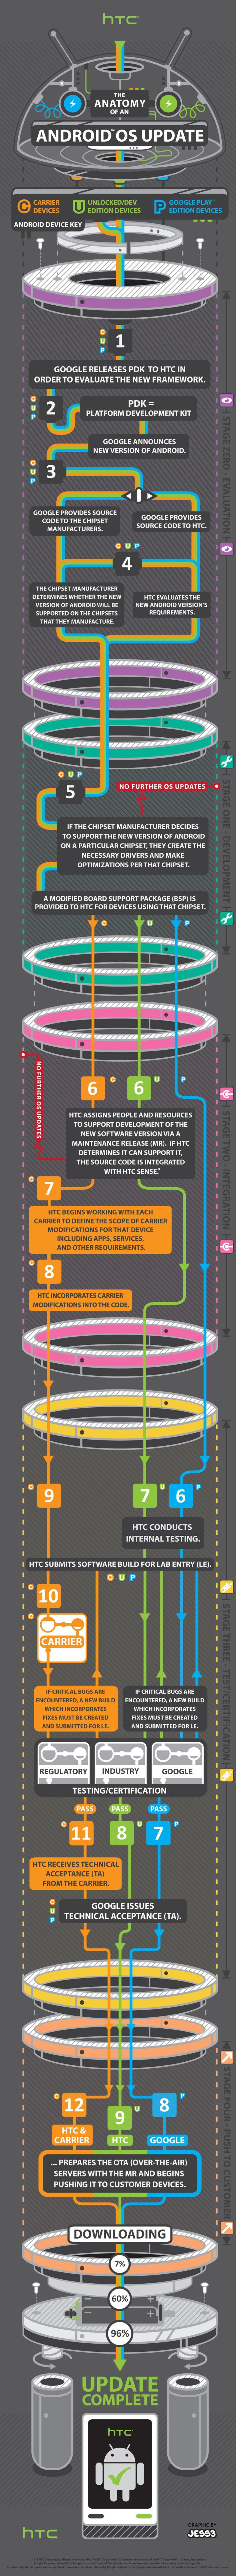 htc infographic for OTA update